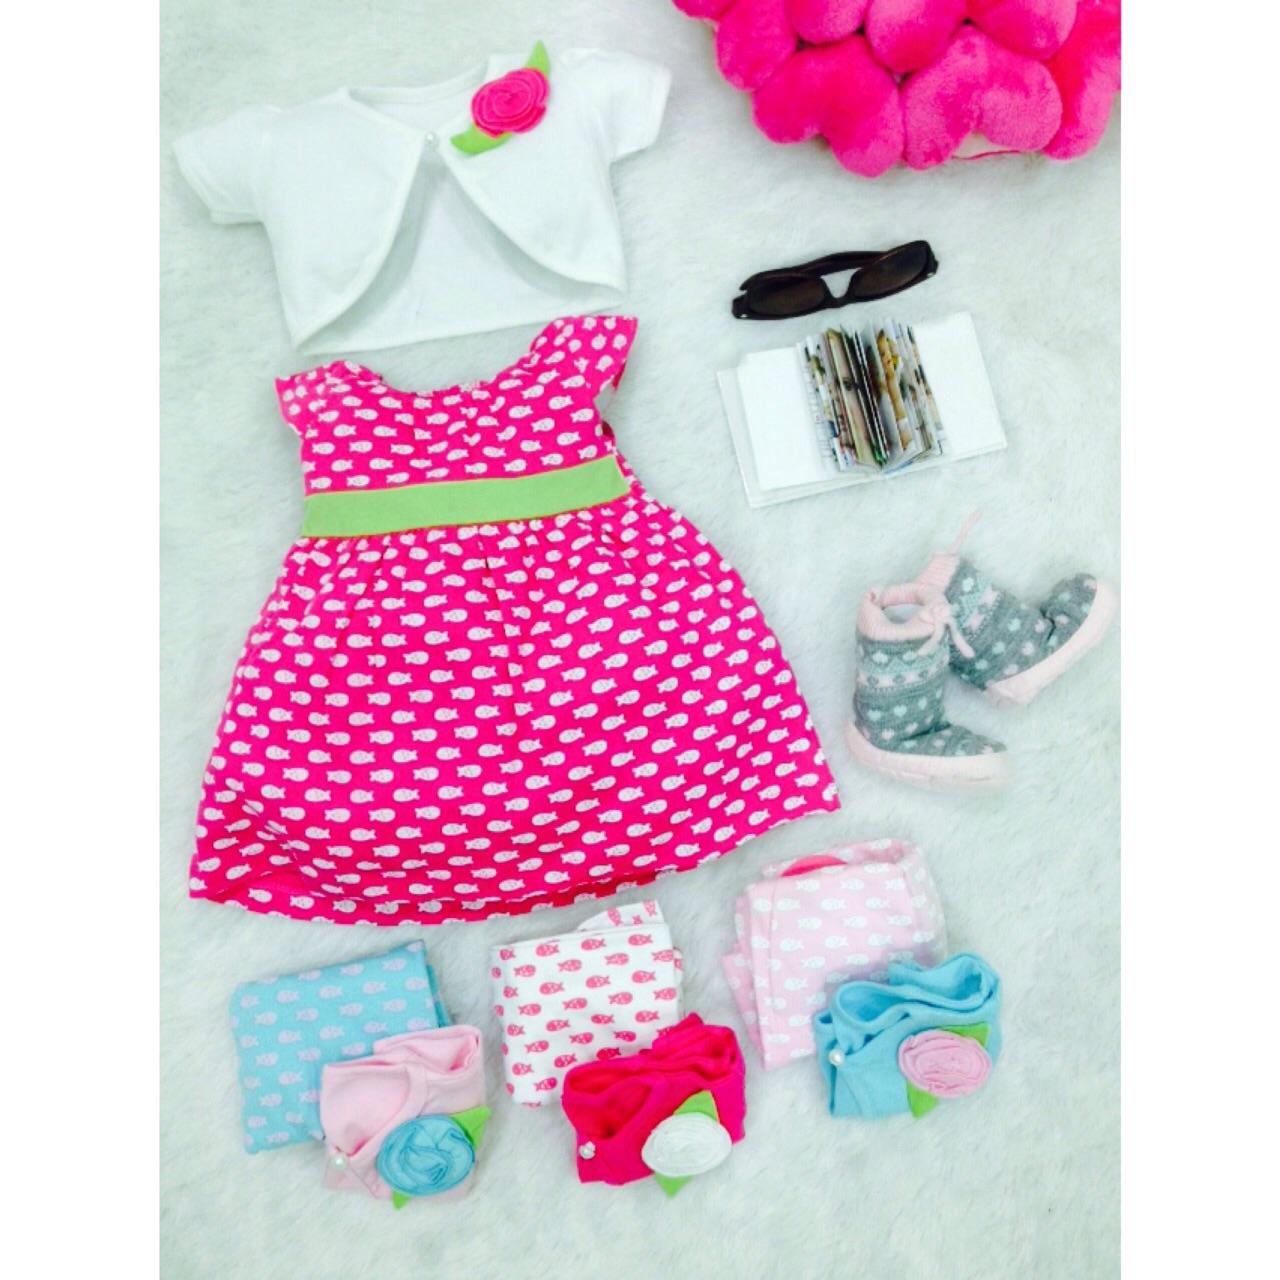 baju bayi lucu murah di sleman jawa